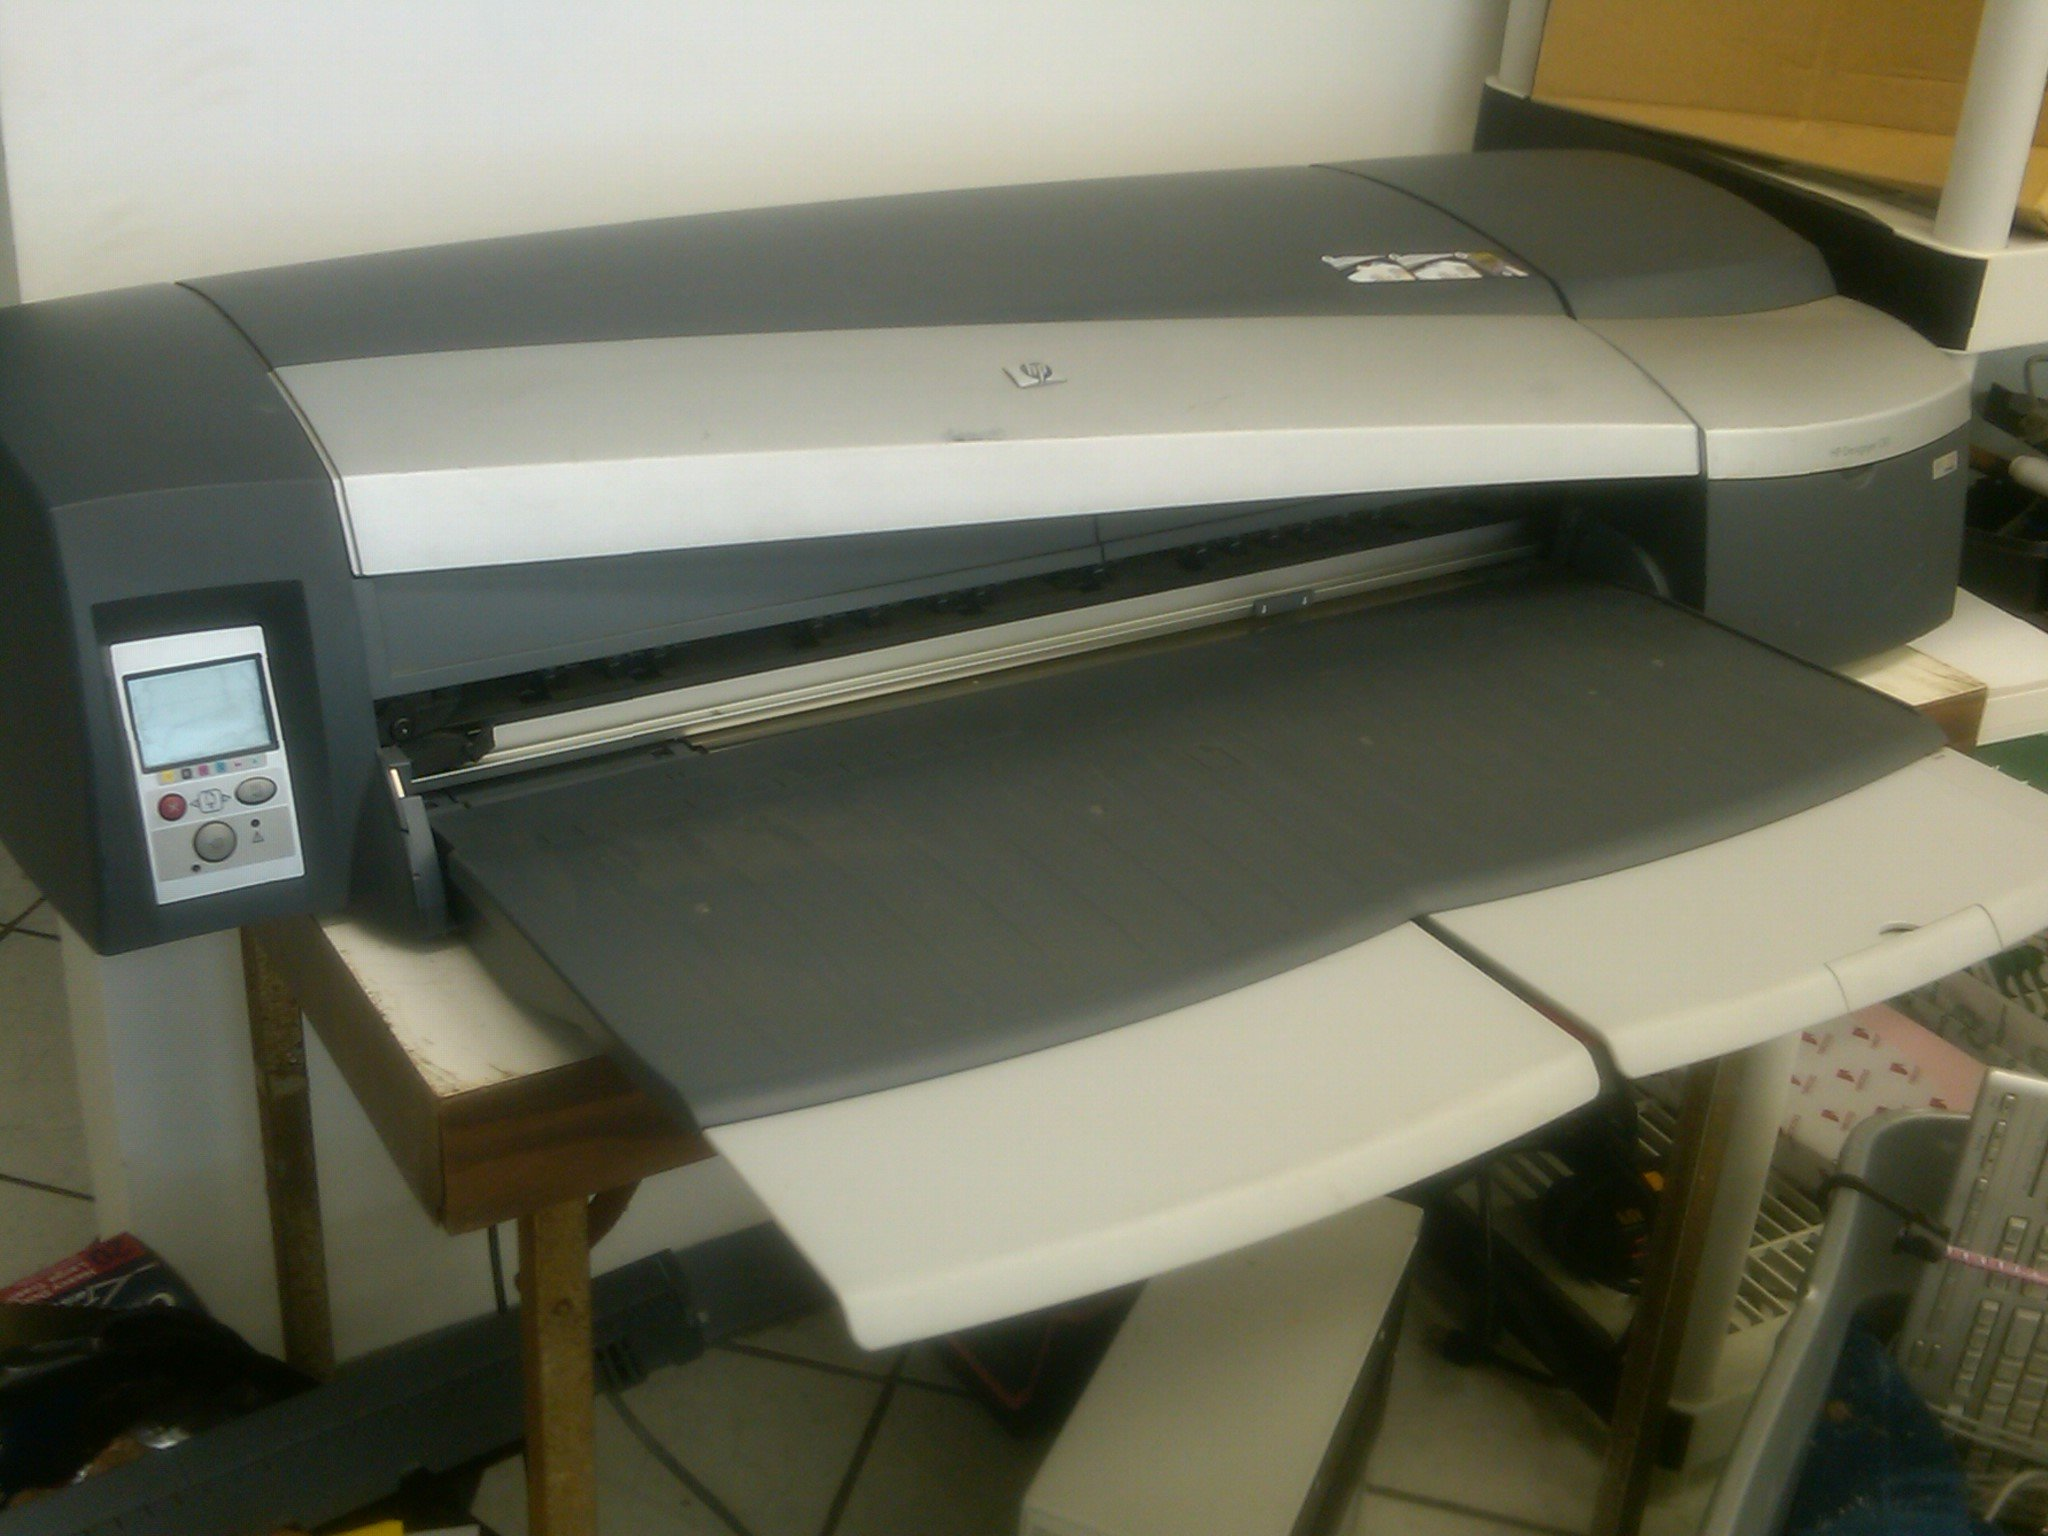 HP Impresora HP Designjet 130r - Impresora de gran formato (PCL 3 GUI RGB contone de 24